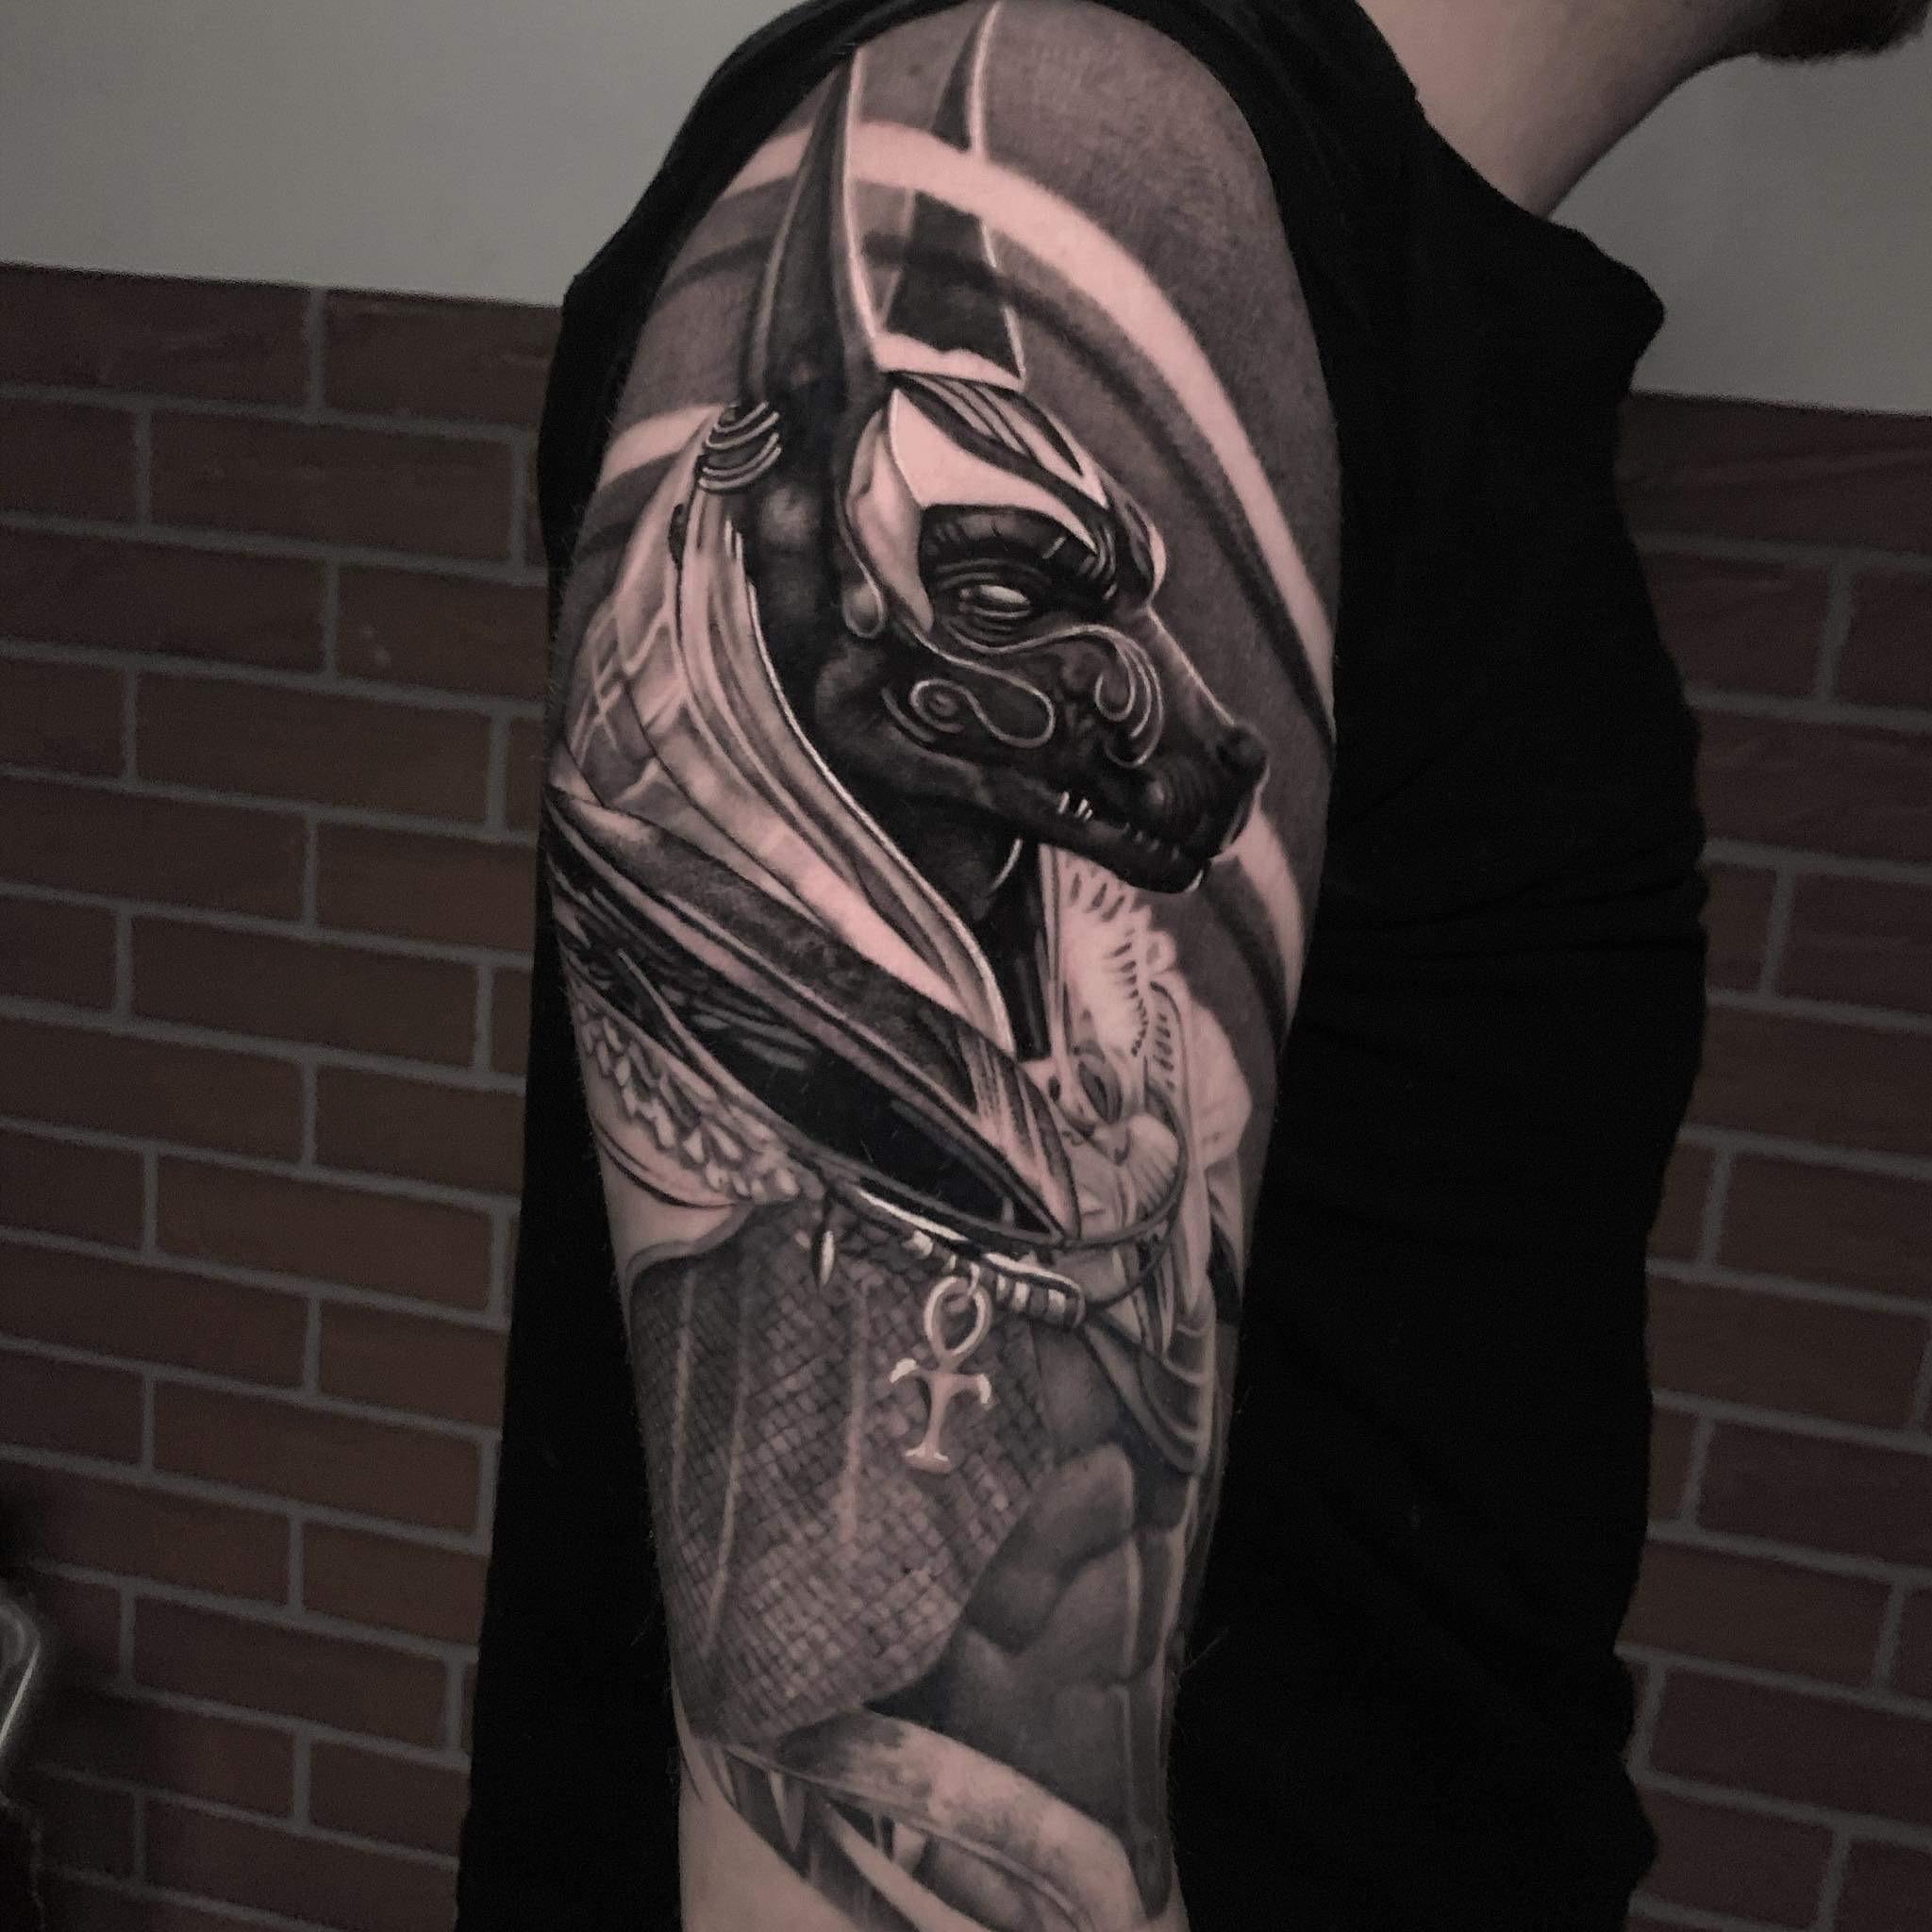 Tattoo fernab von Fulda